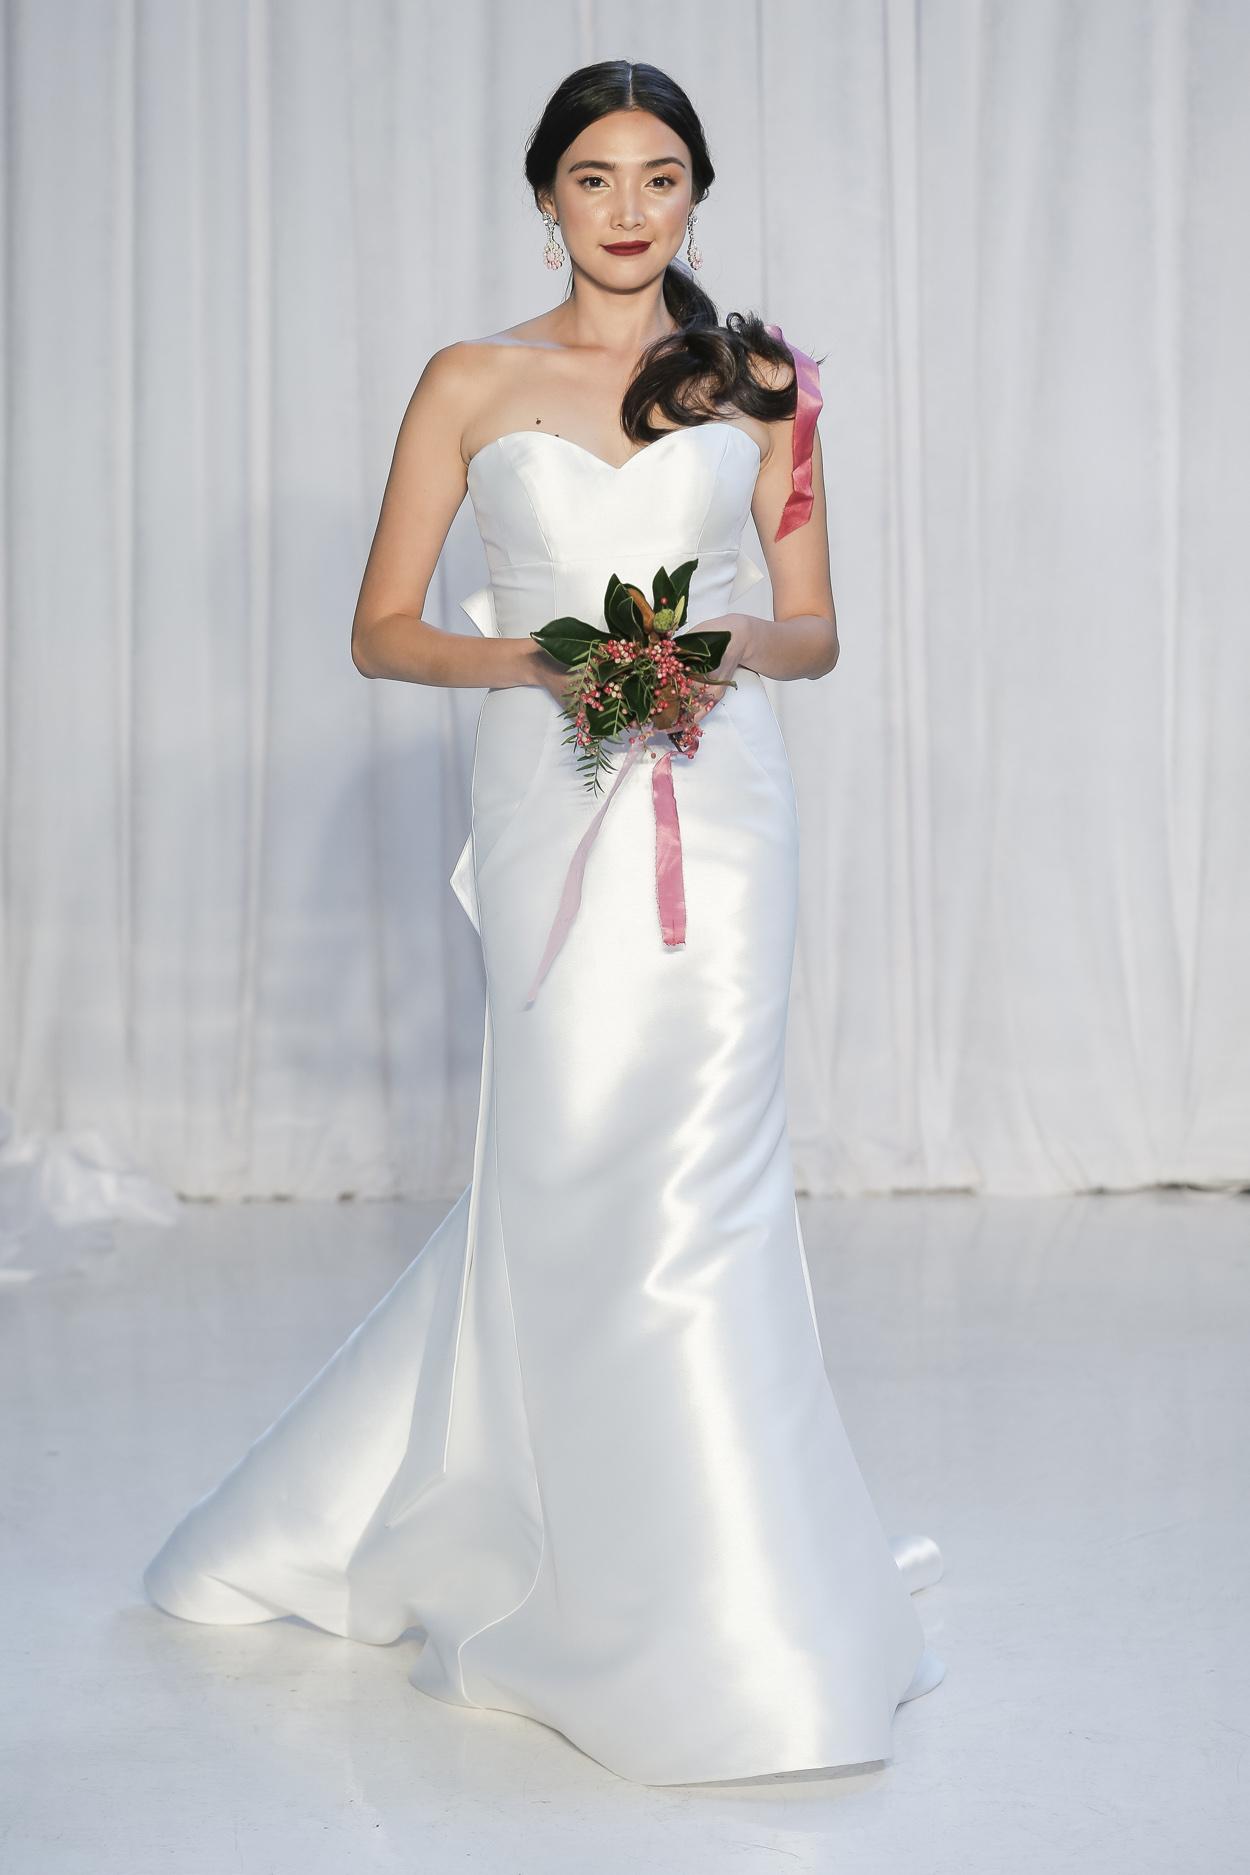 Vivienne satin silk wedding dress with sweetheart neckline by Anne Barge